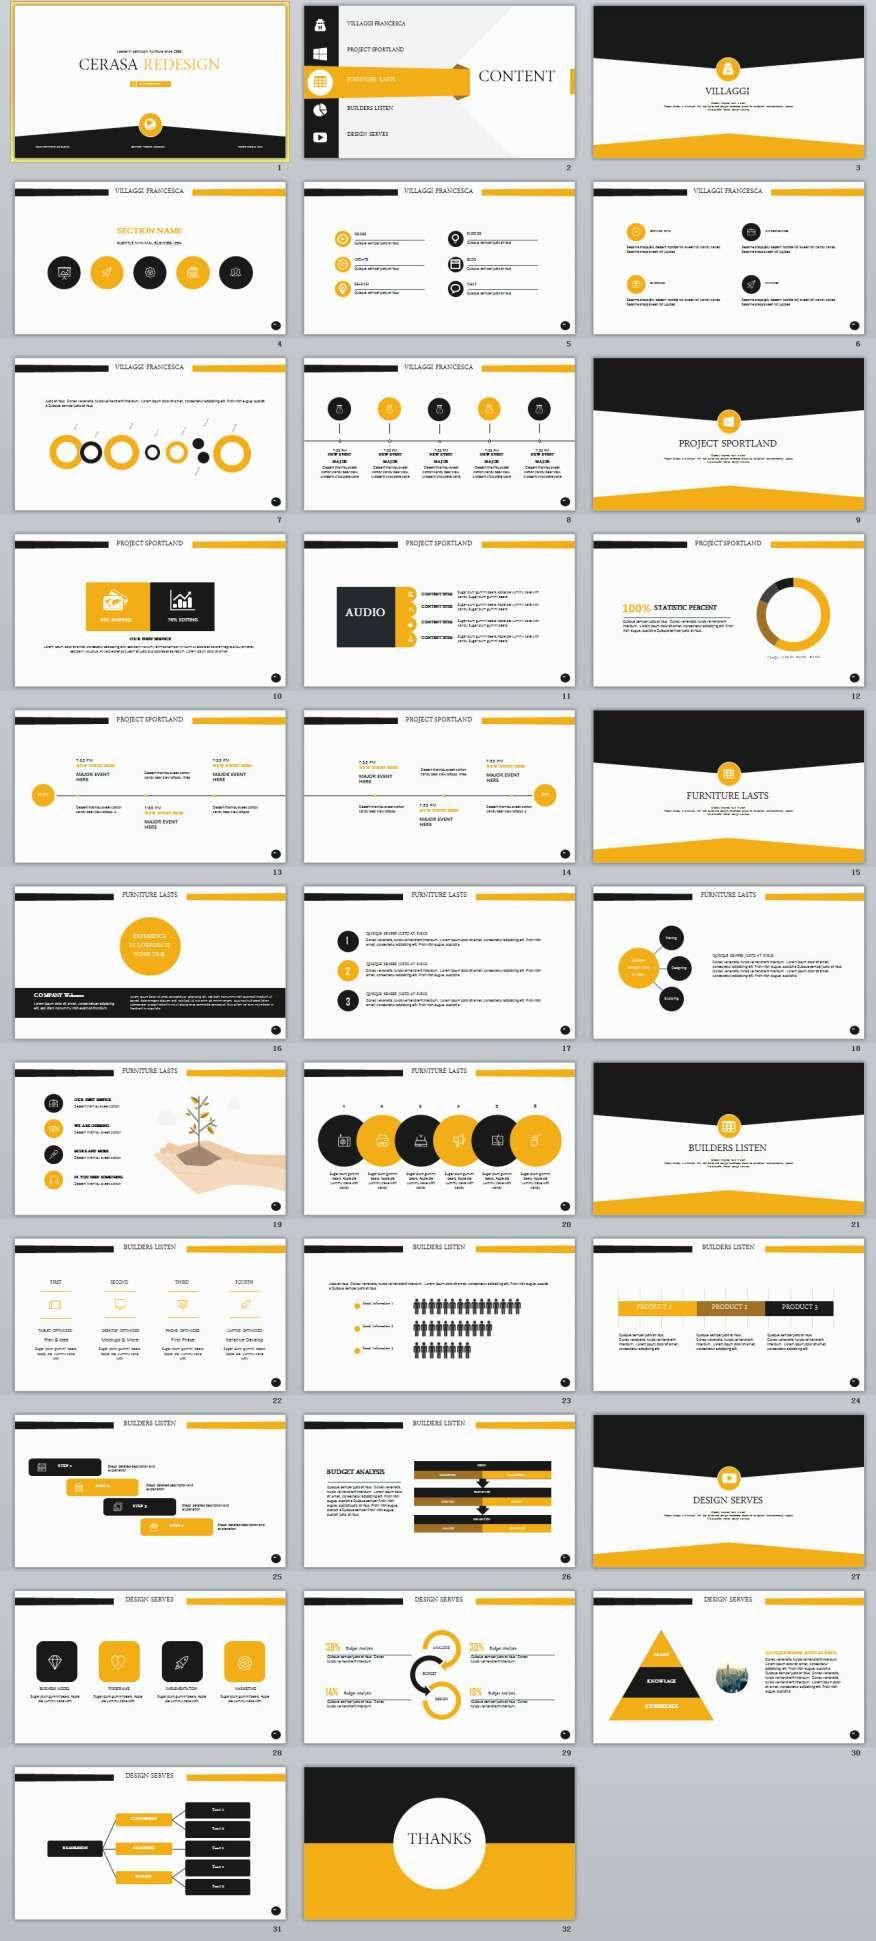 32 annual report powerpoint template design 32 annual report powerpoint template the highest quality powerpoint templates and keynote templates download toneelgroepblik Images